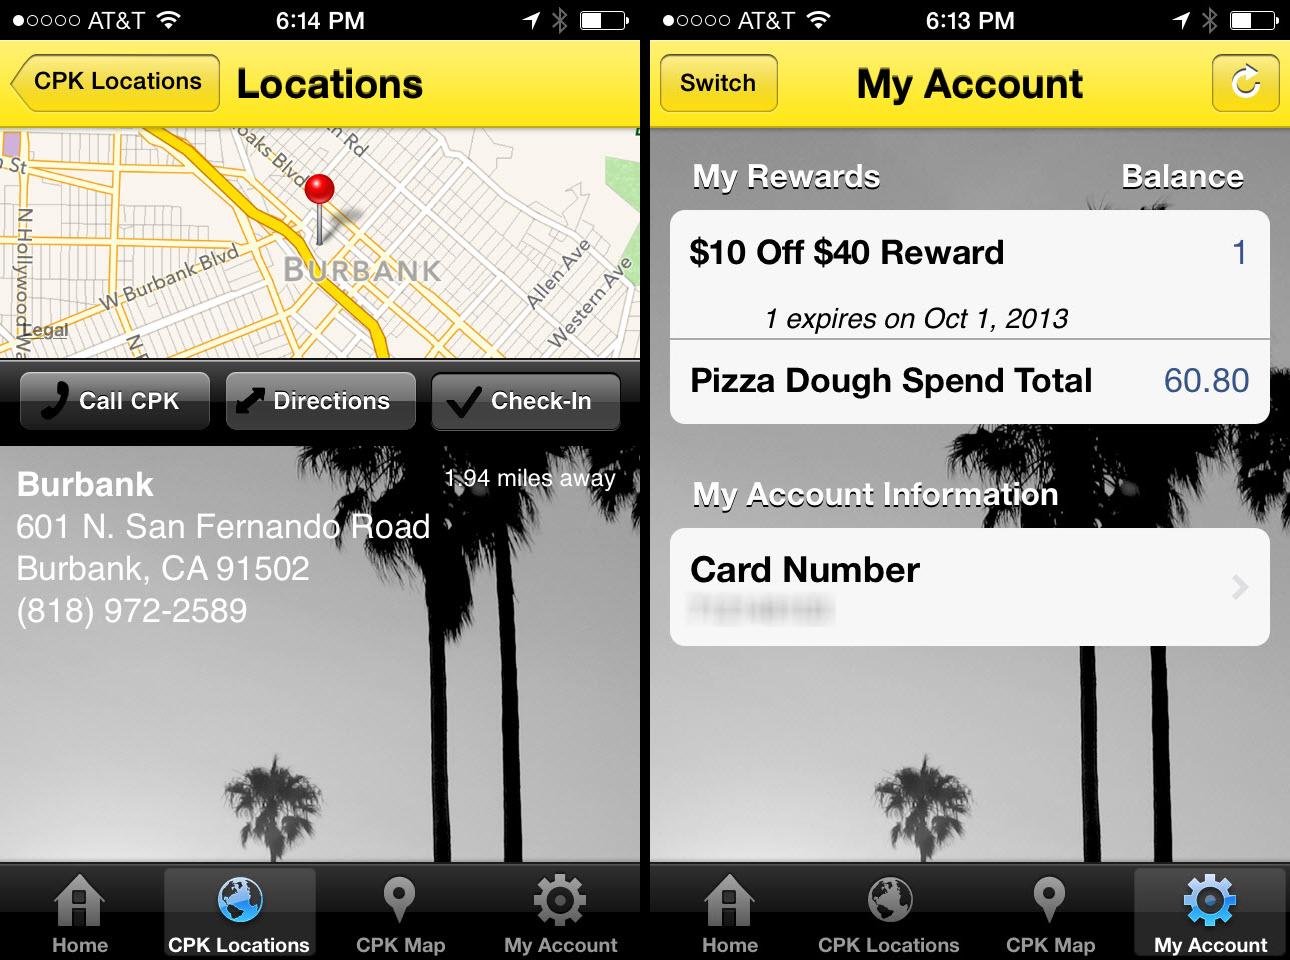 California Pizza Kitchenのモバイルアプリはクーポンと特典の管理をするものである。しかし、その体験のシームレスさには改善の余地がある。